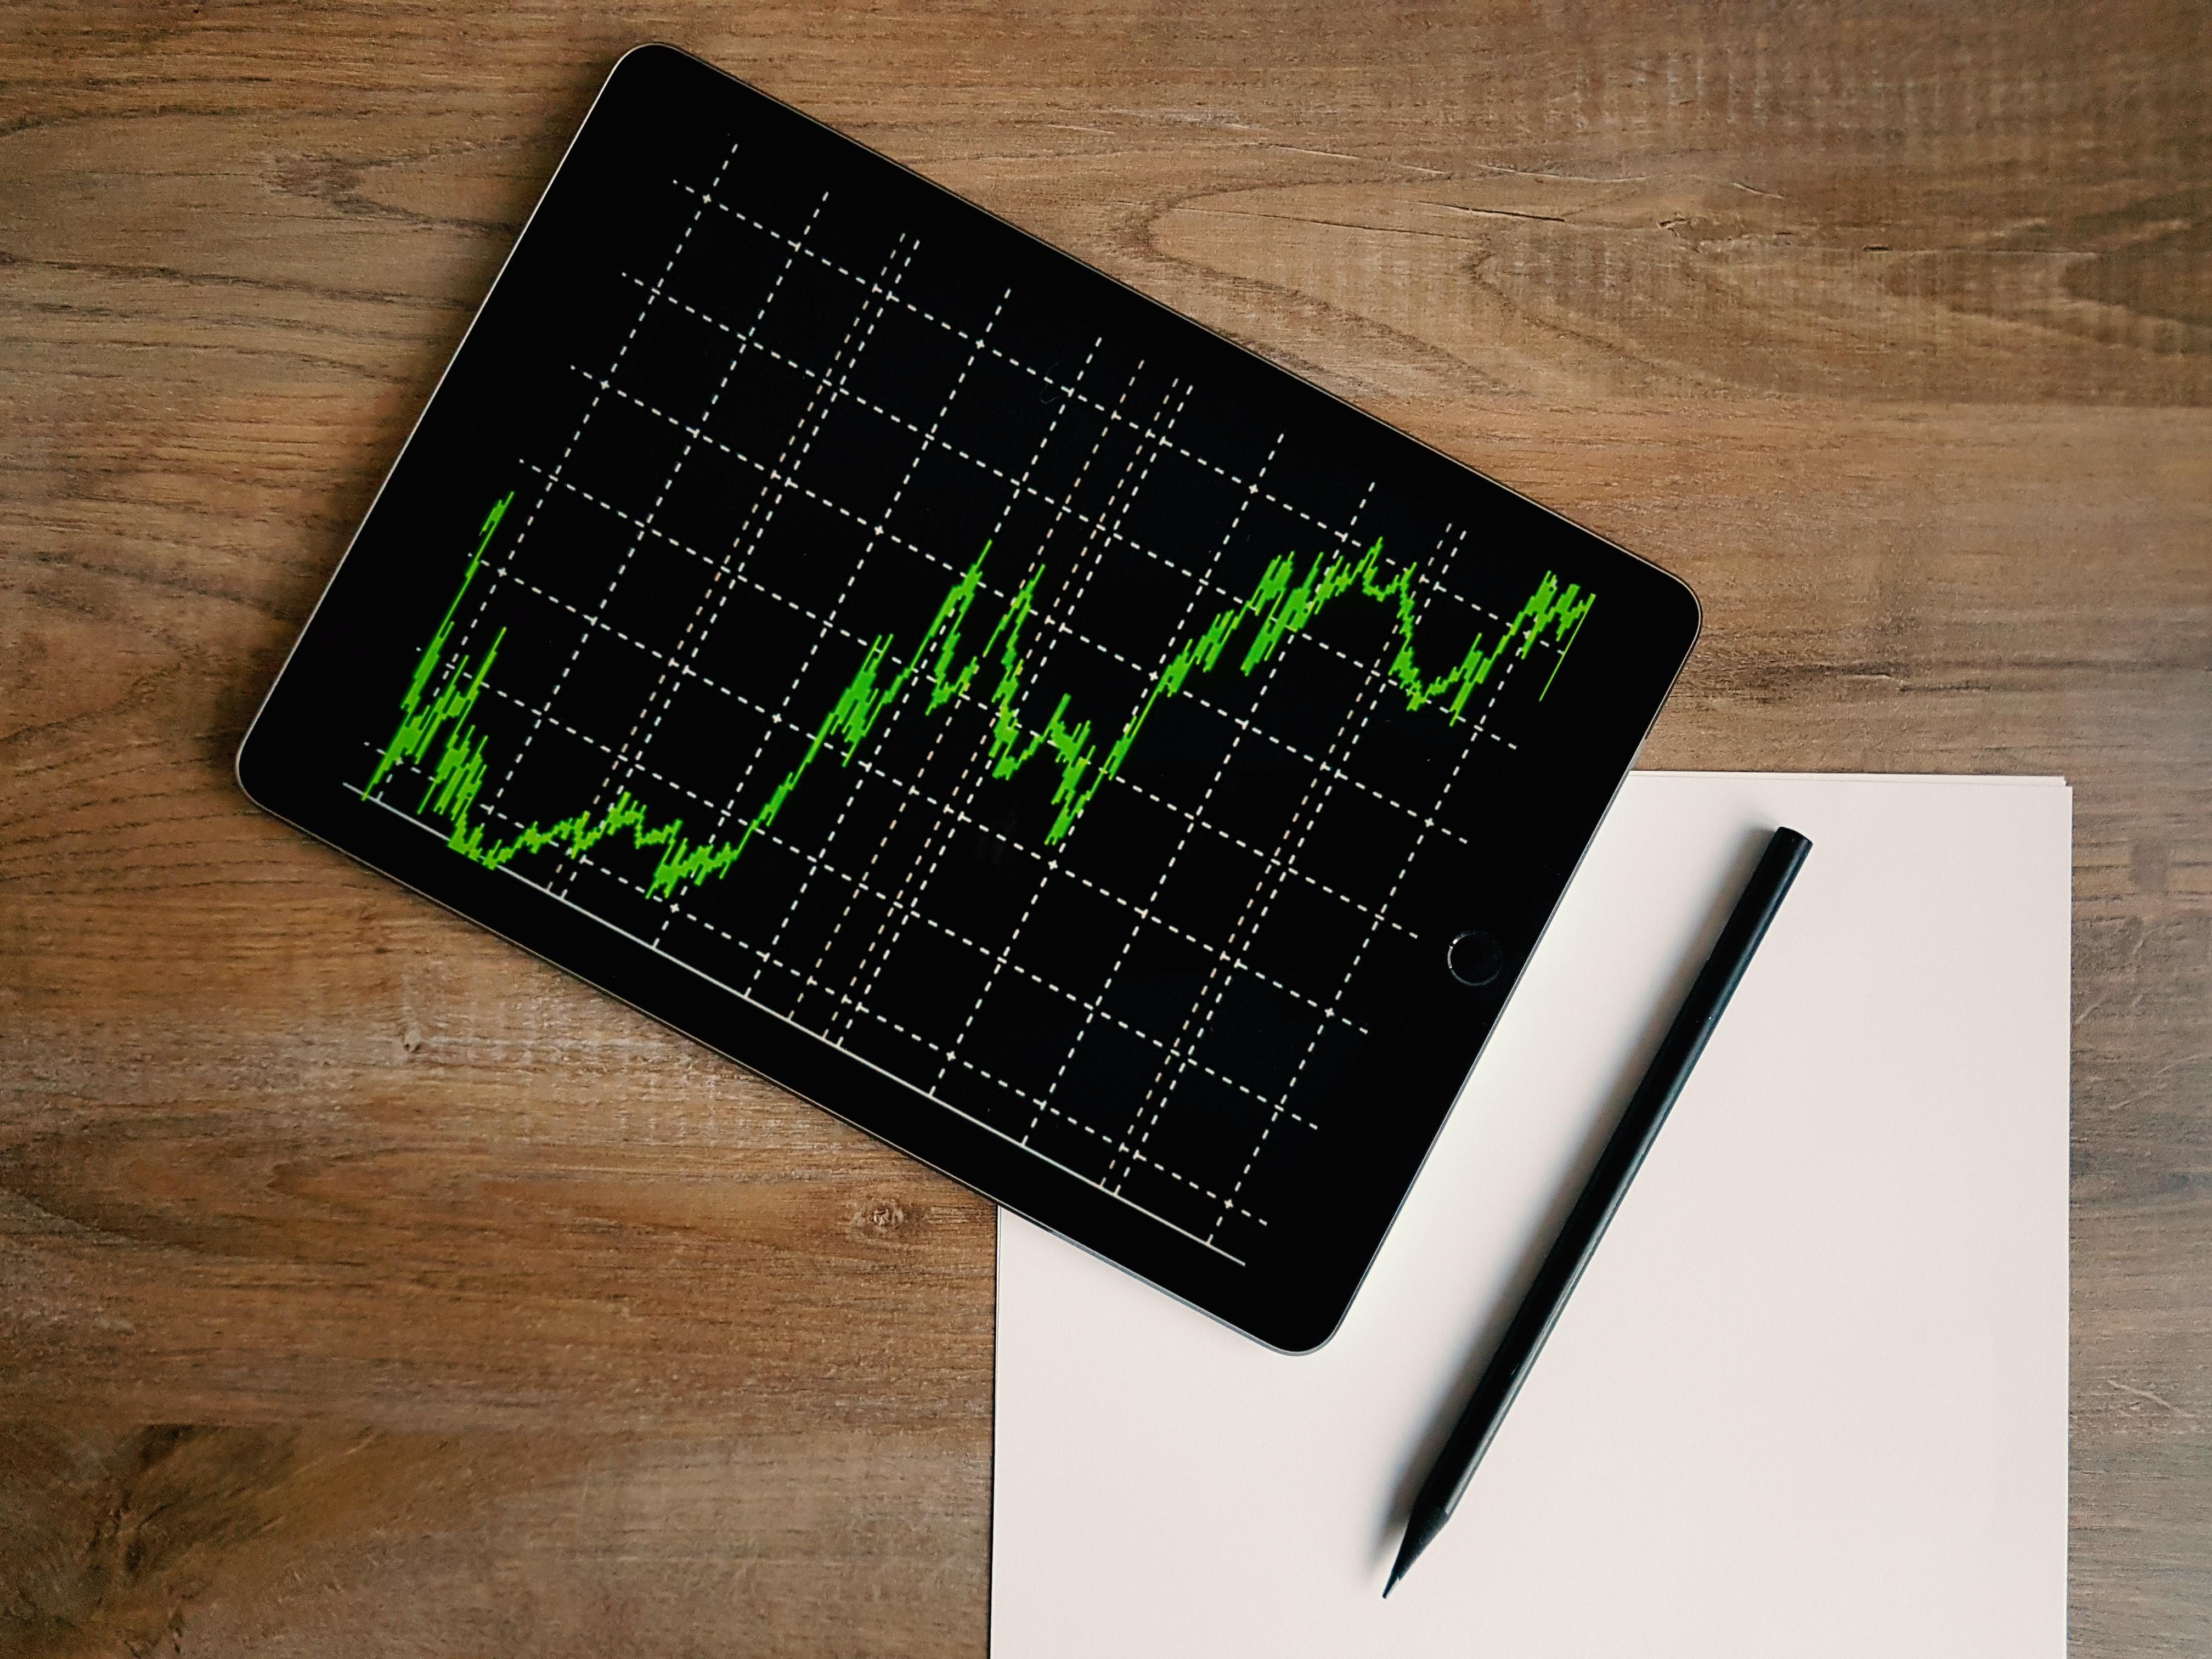 Big Data Company Databricks Set to Launch SQL Analytics